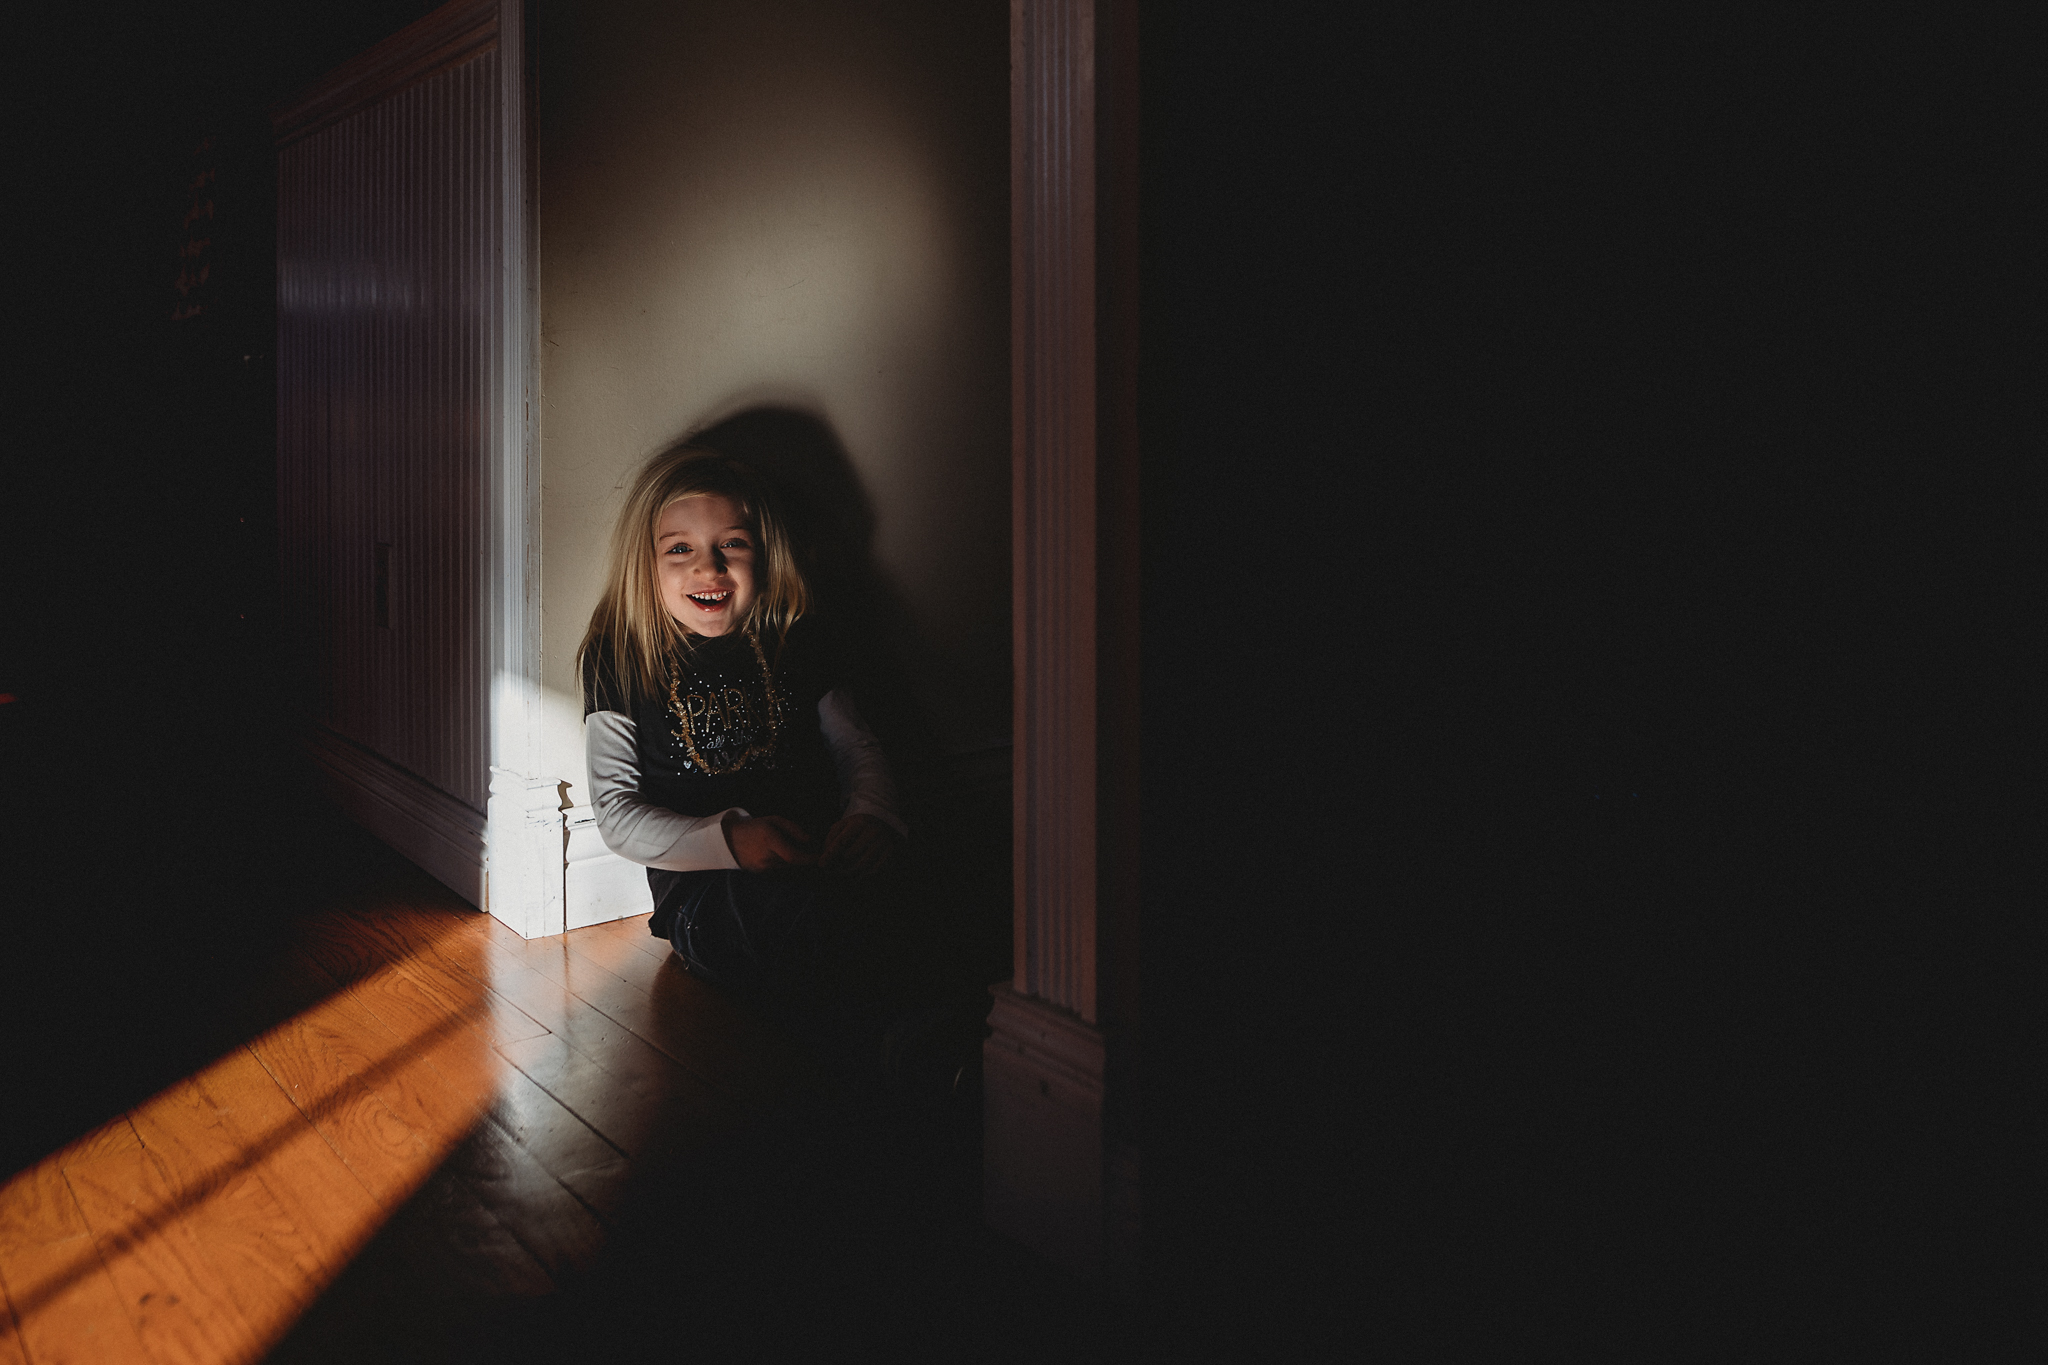 Long-island-photographer-hello-olivia-photography-children-kids-photos-new-york-lifestyle-portraits-suffolk-County-LI-29.jpg